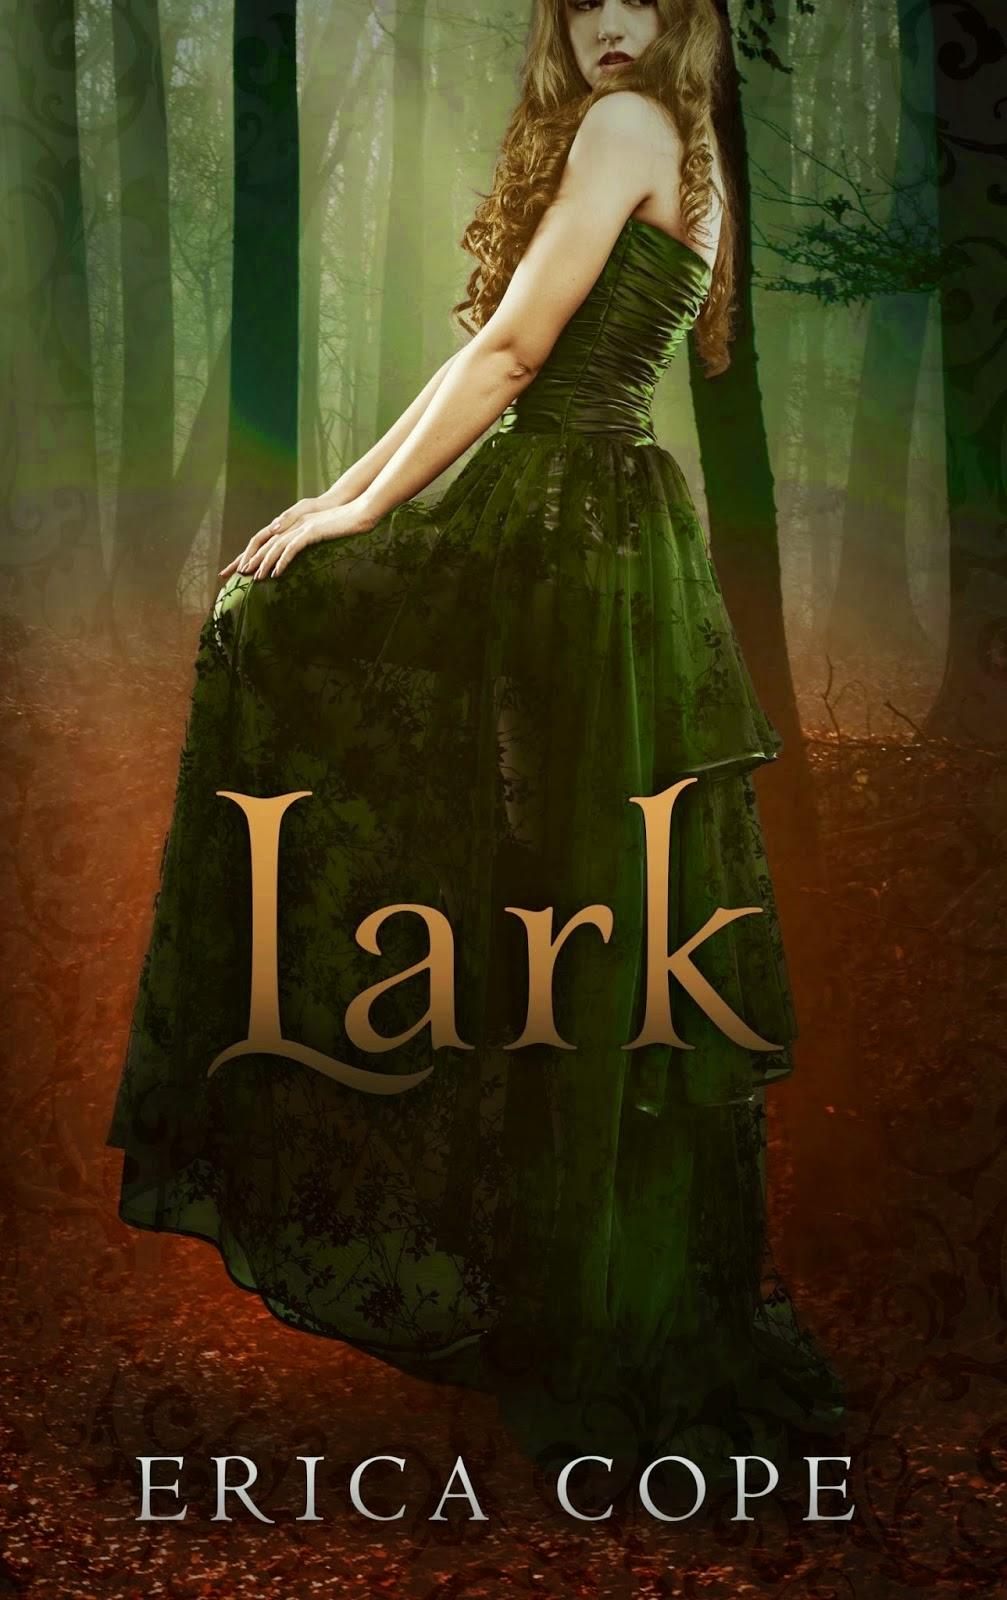 http://www.amazon.com/Lark-Erica-Cope-ebook/dp/B00BBPF13Y/ref=sr_1_1?ie=UTF8&qid=1411212995&sr=8-1&keywords=lark+erica+cope